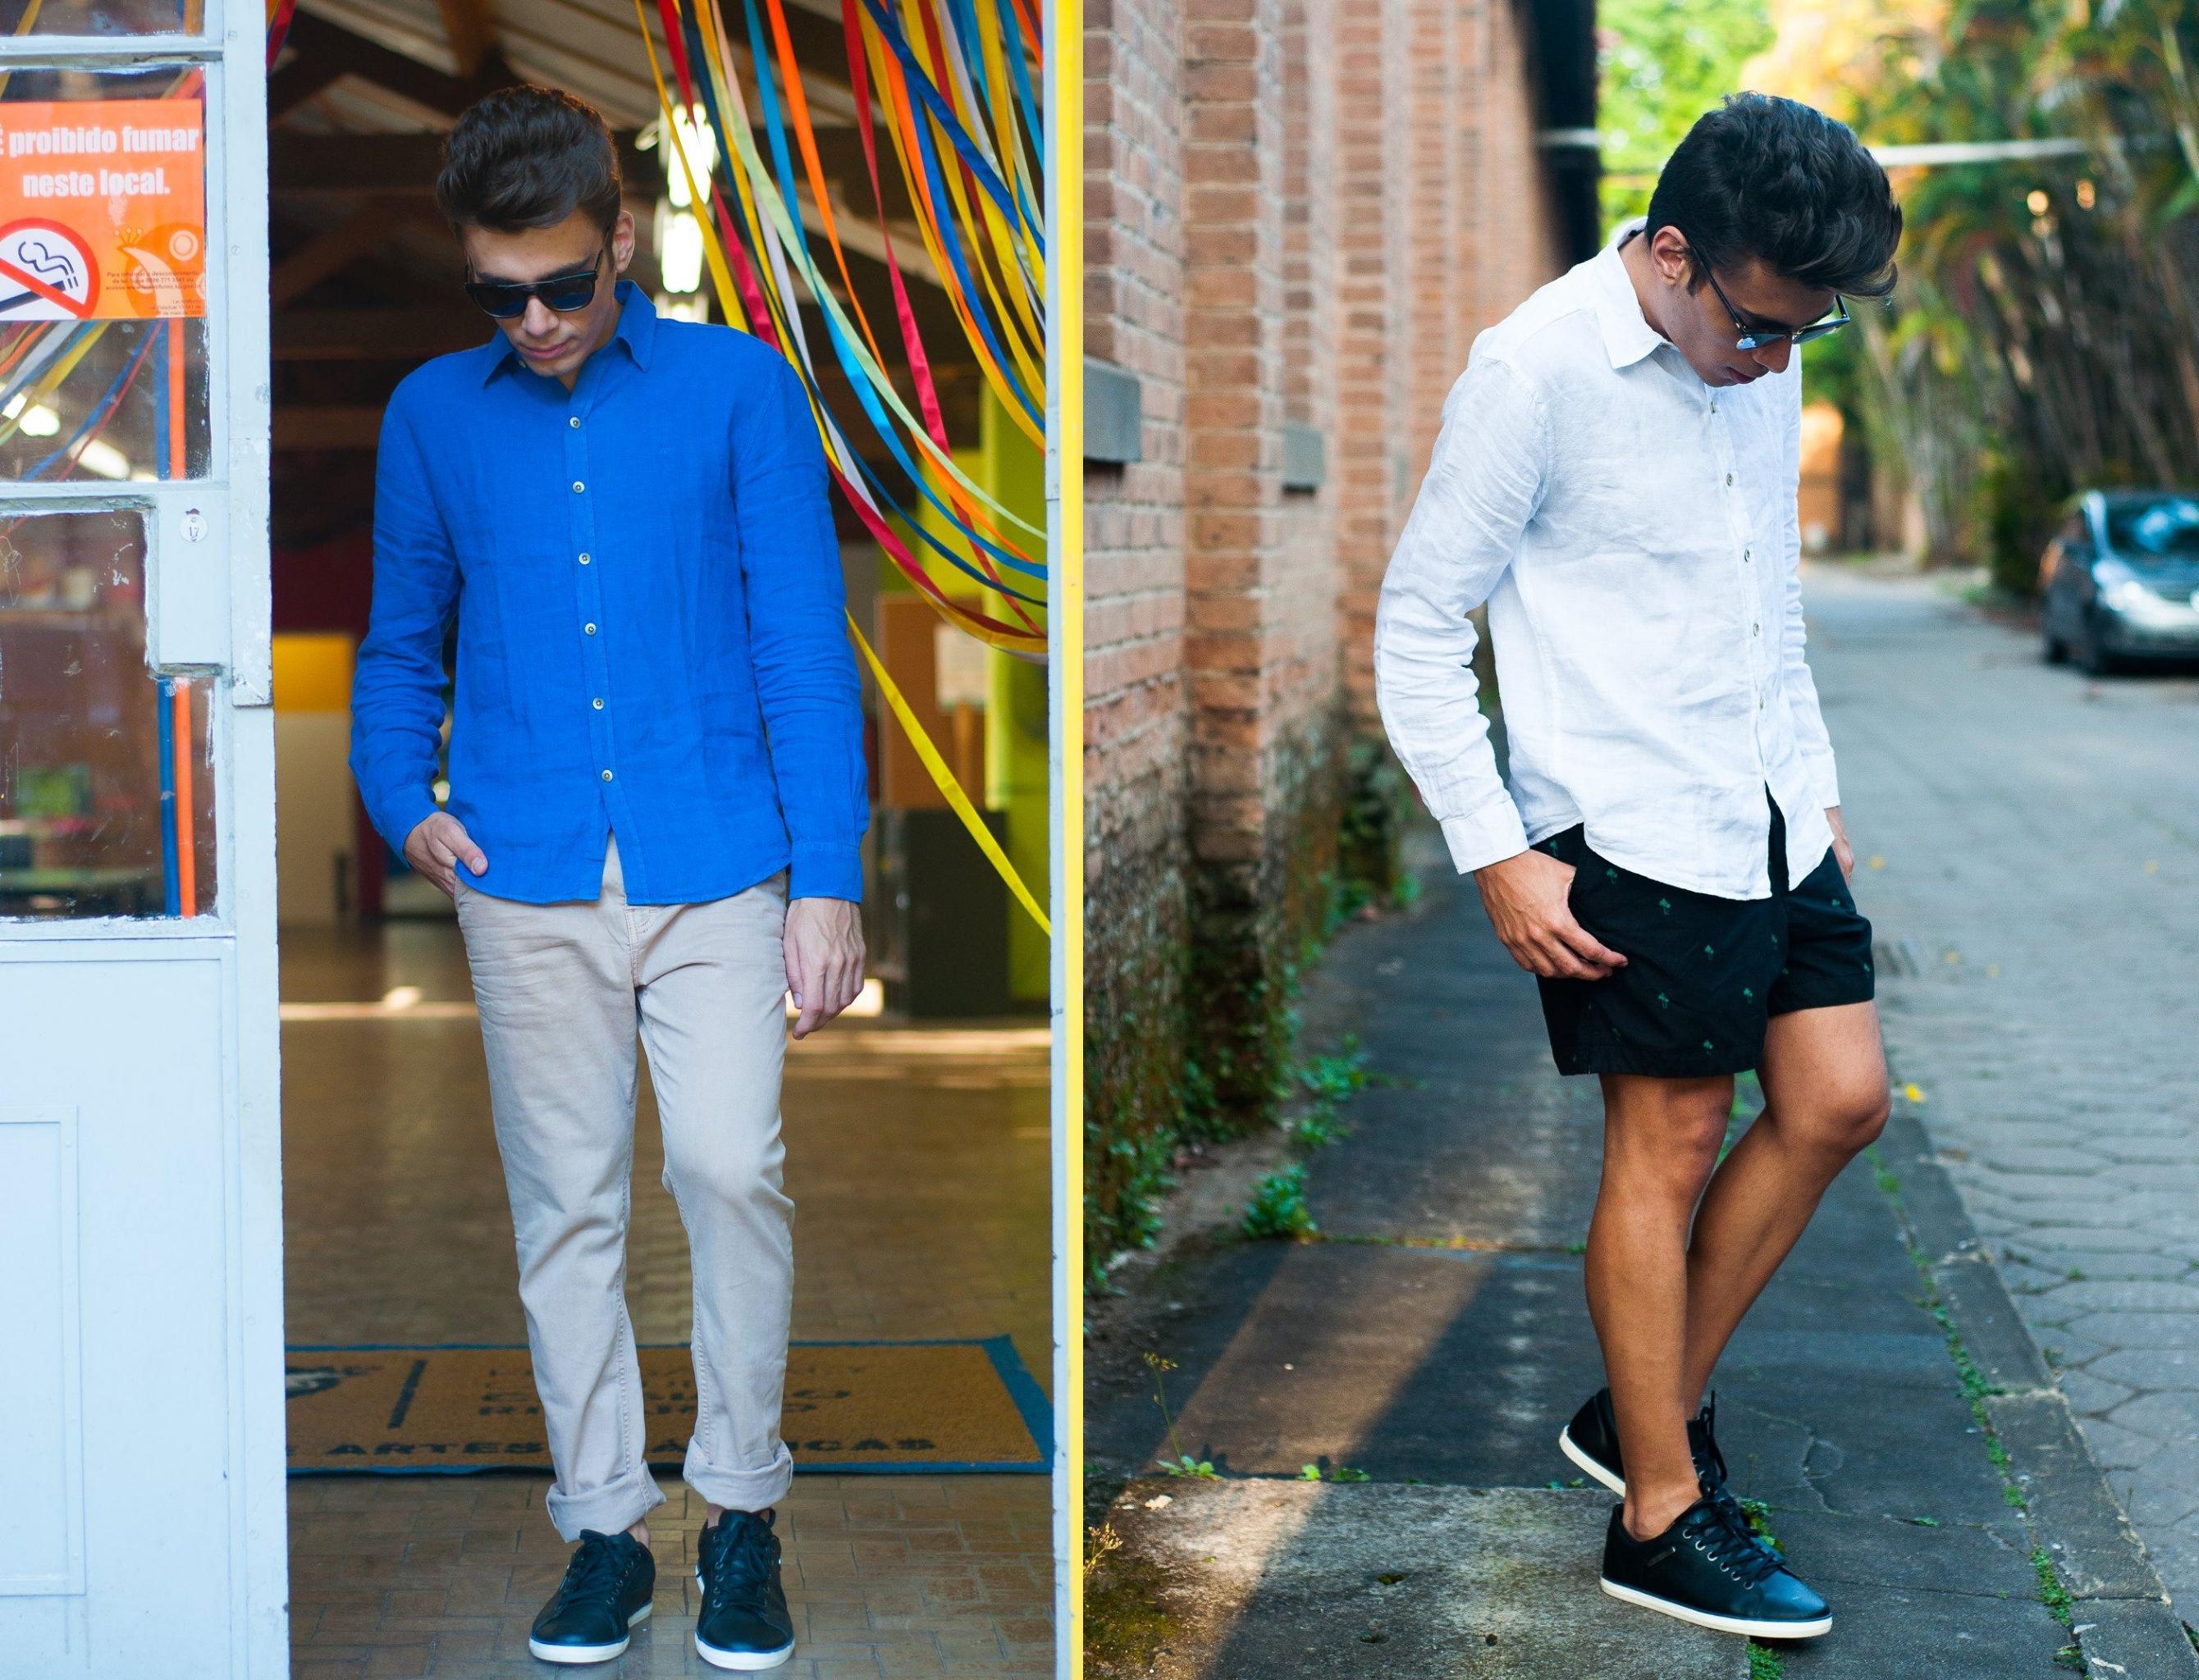 4 Looks Masculinos Estilosos Pros Dias Quentes Moda Sem Censura Blog De Moda Masculina